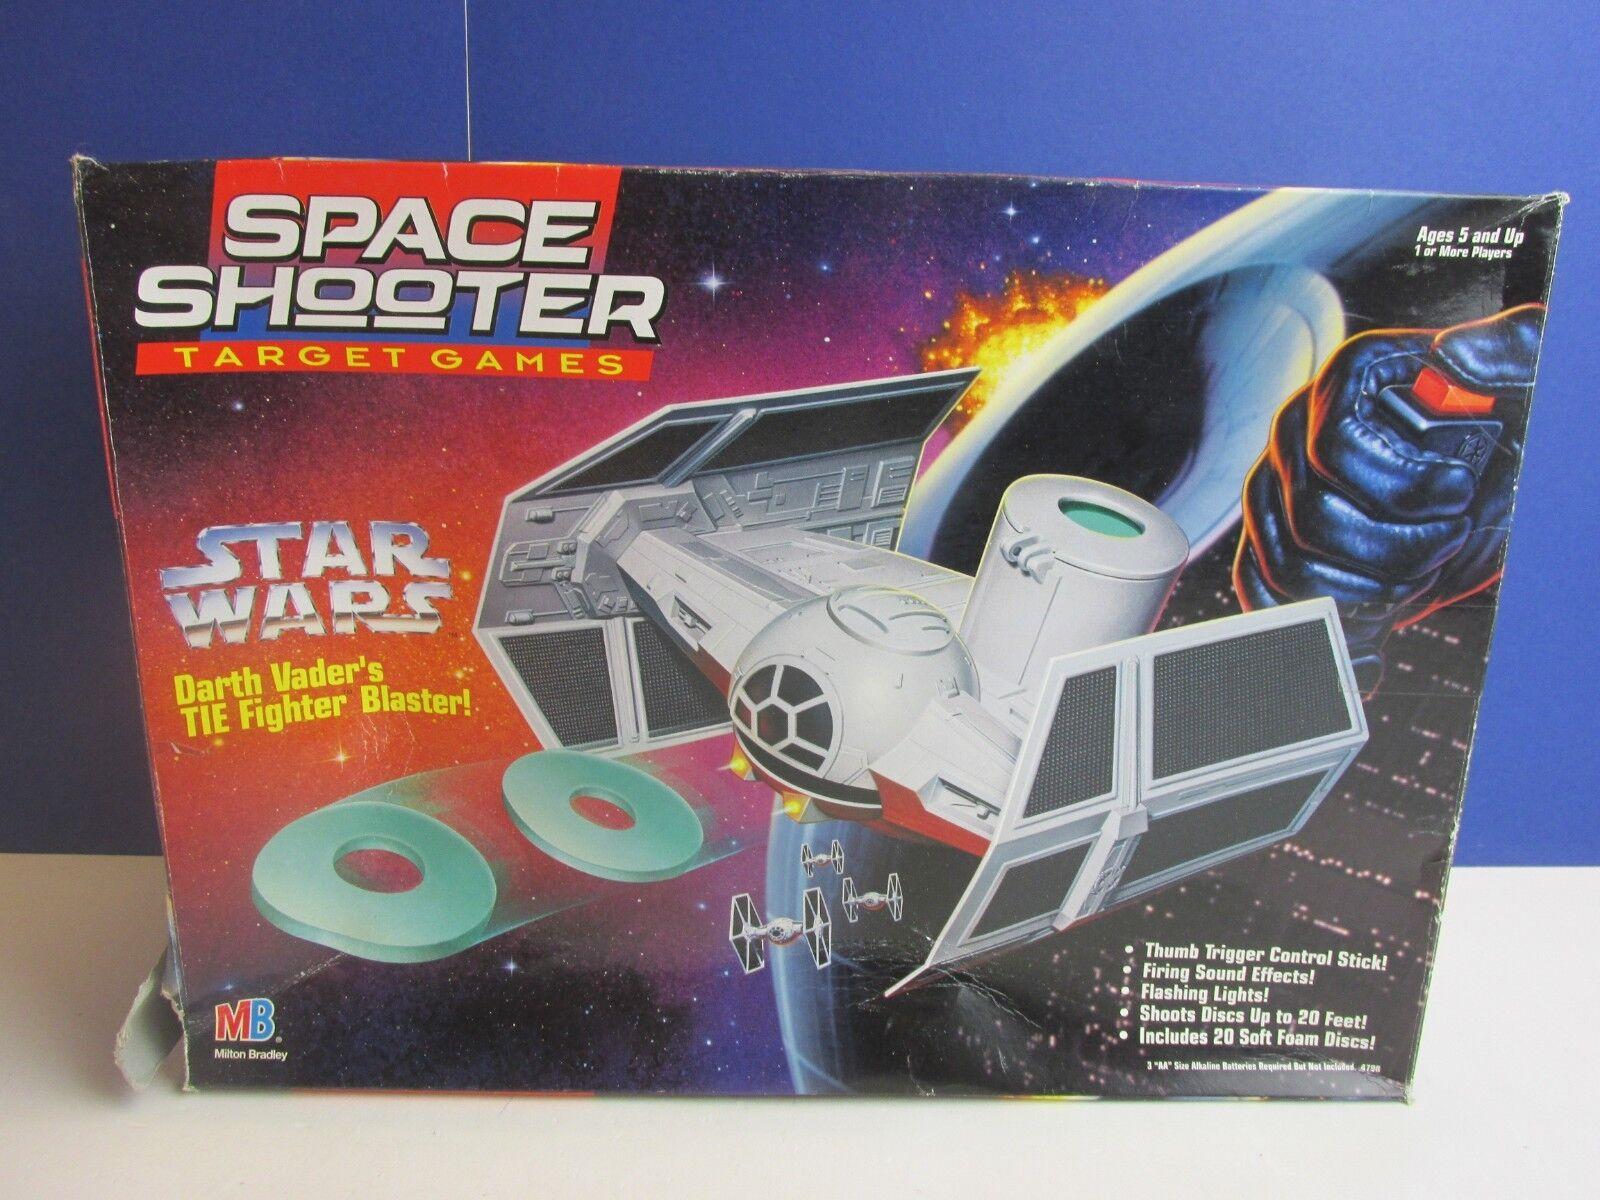 RARE star wars DARTH VADER TIE FIGHTER blaster space shooter TARGET GAME MB 58y